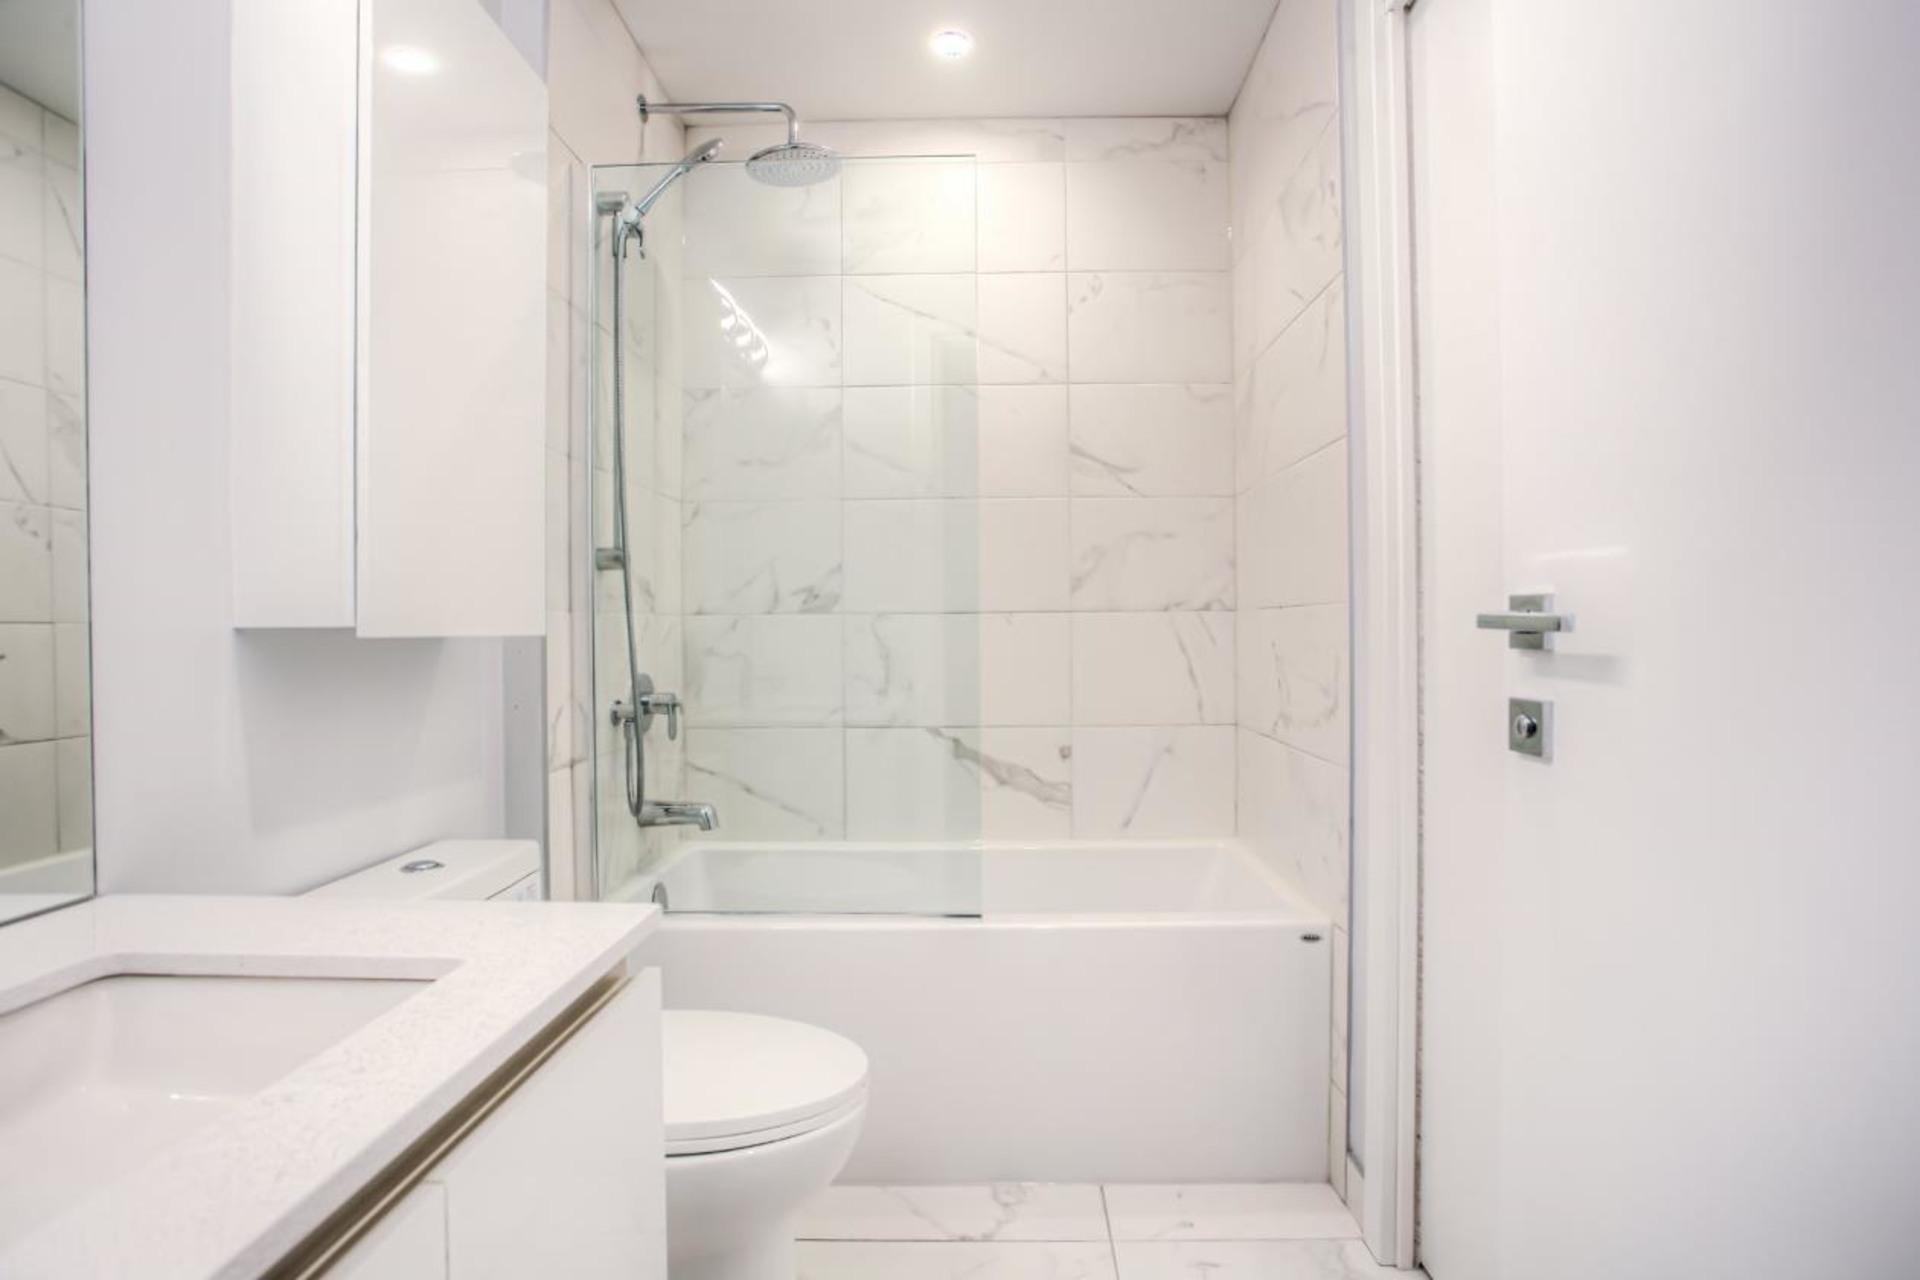 image 5 - 公寓 出租 Montréal - 6 室